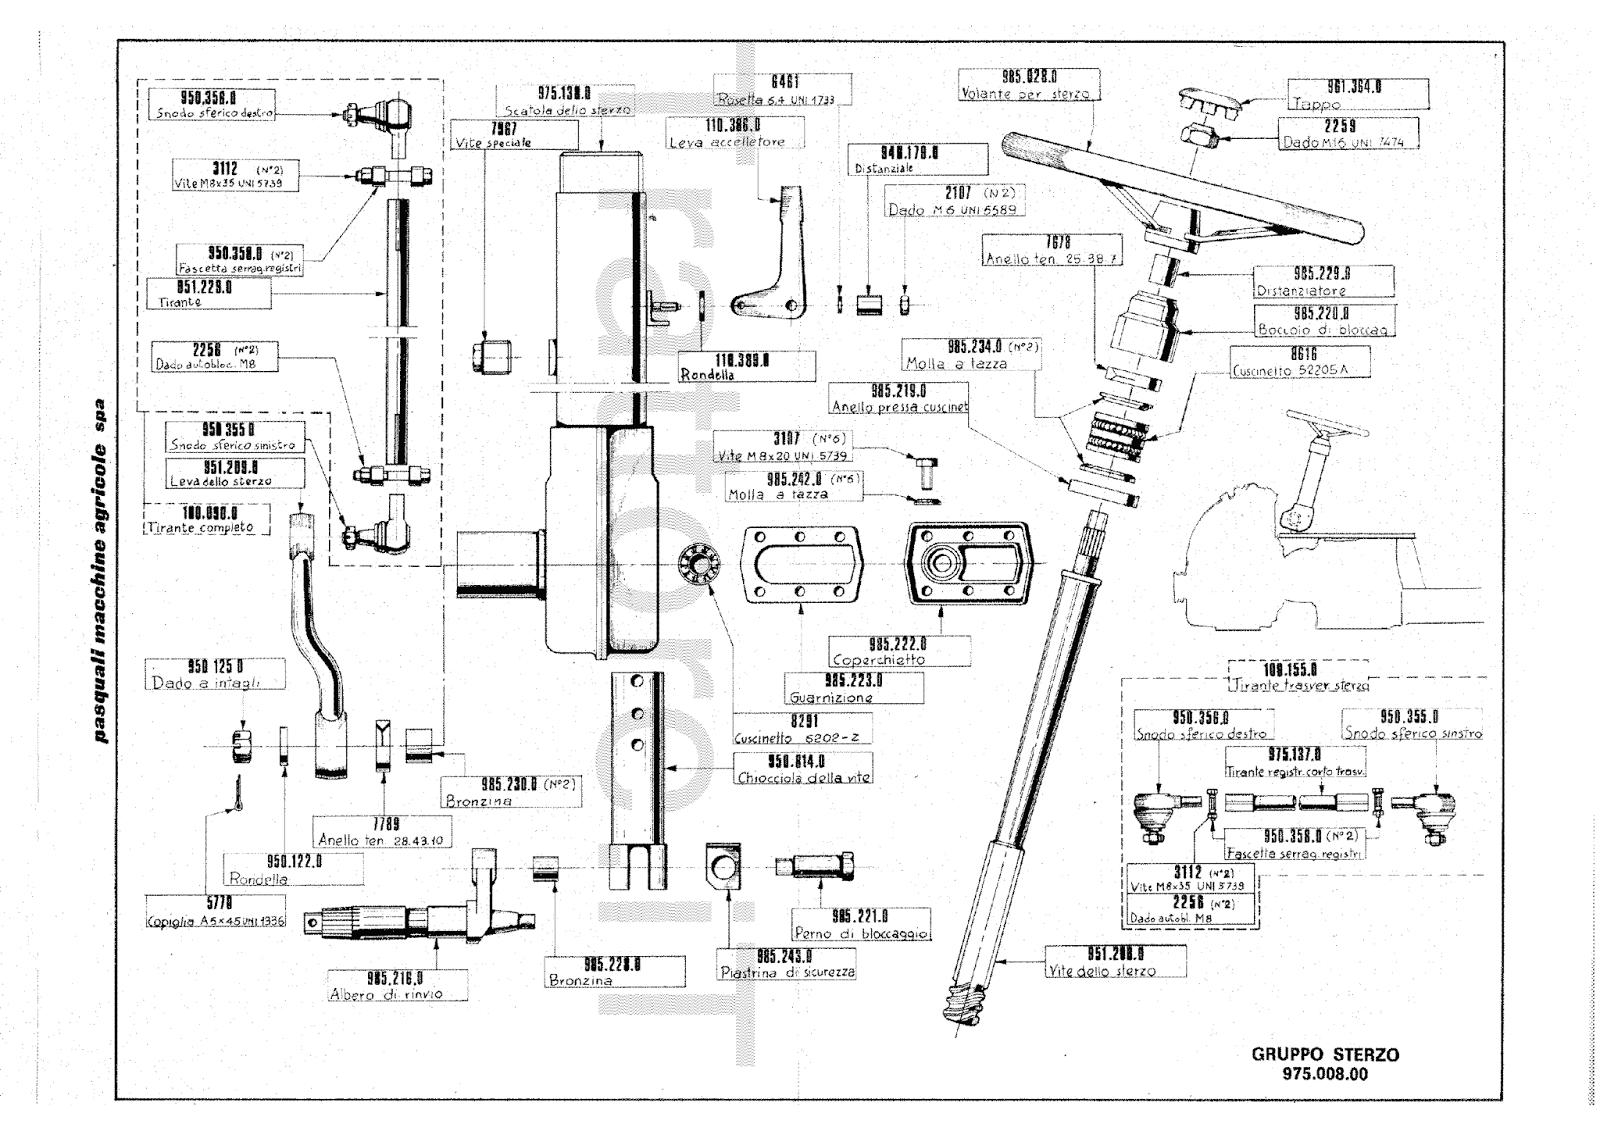 InfoTrattore.it: Motoagricola Pasquali 975 CV 30 Manuale